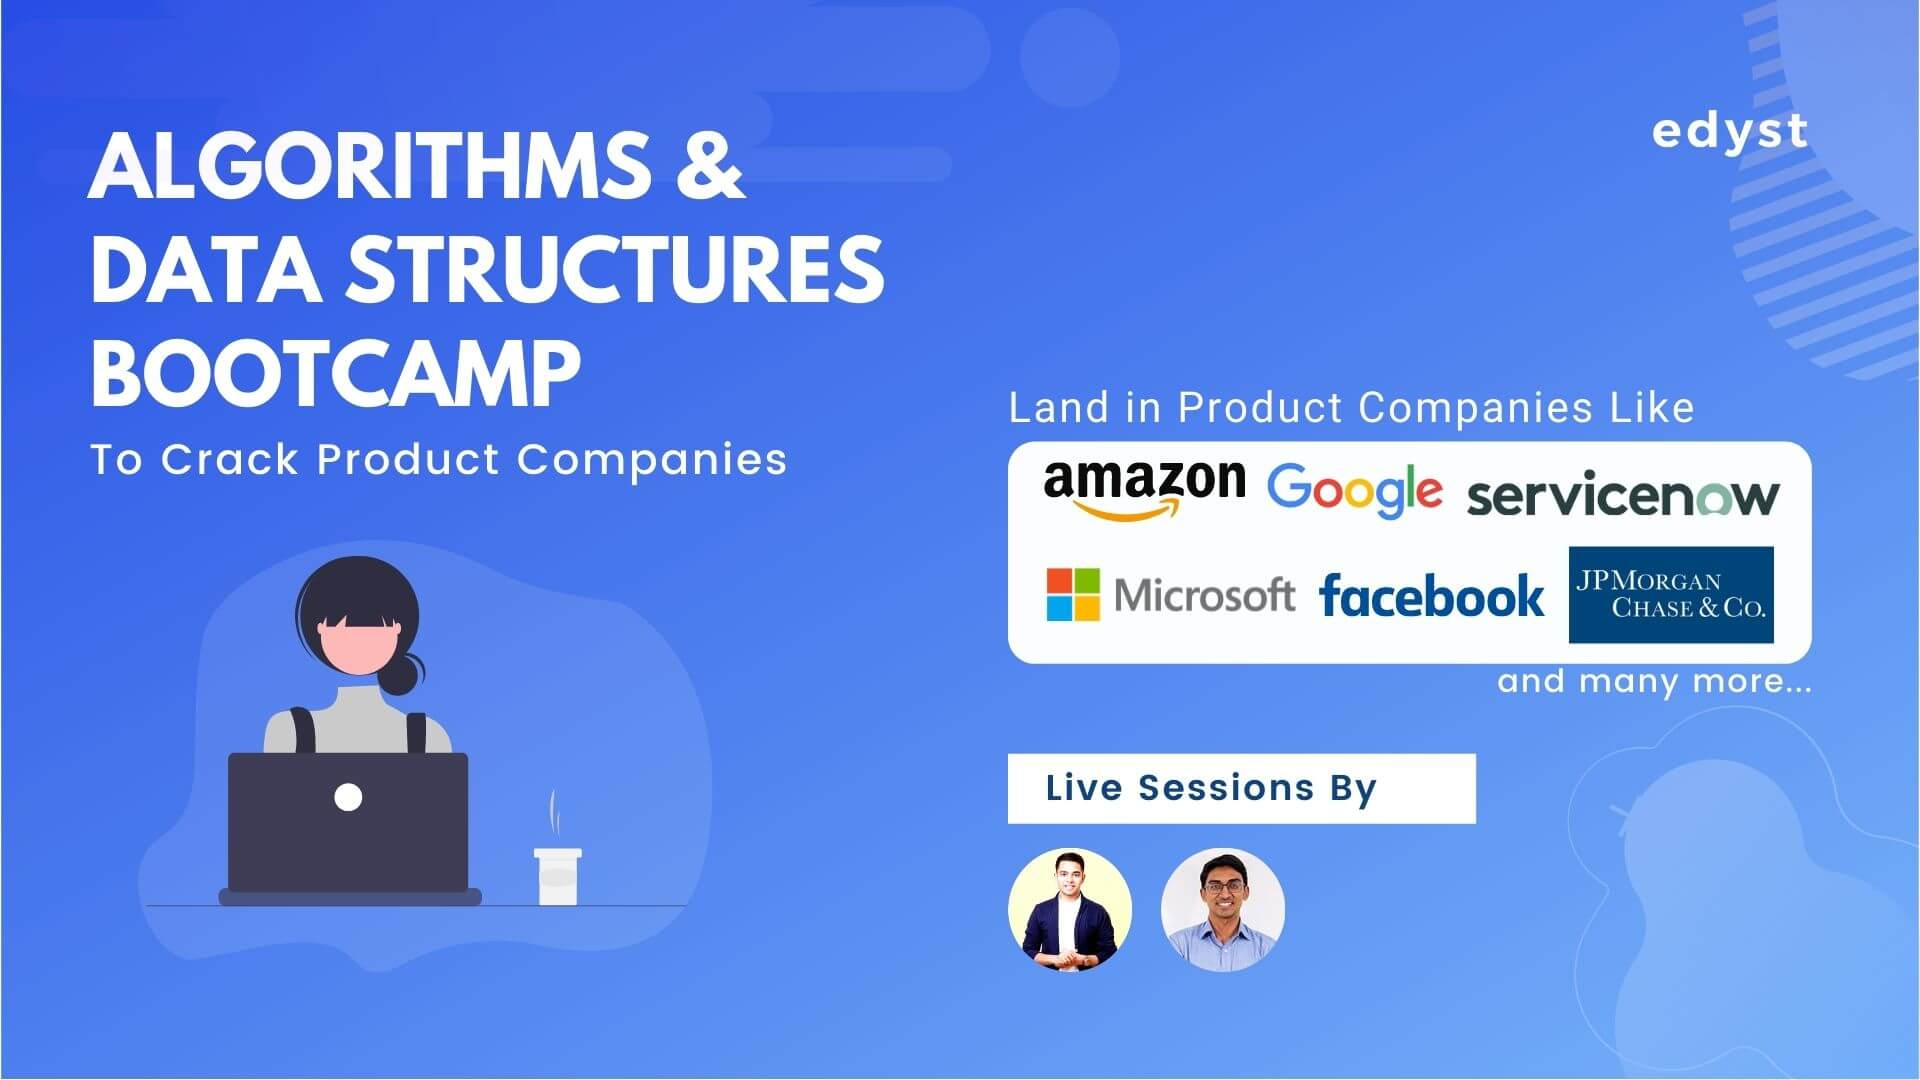 Algorithms & Data Structures Bootcamp